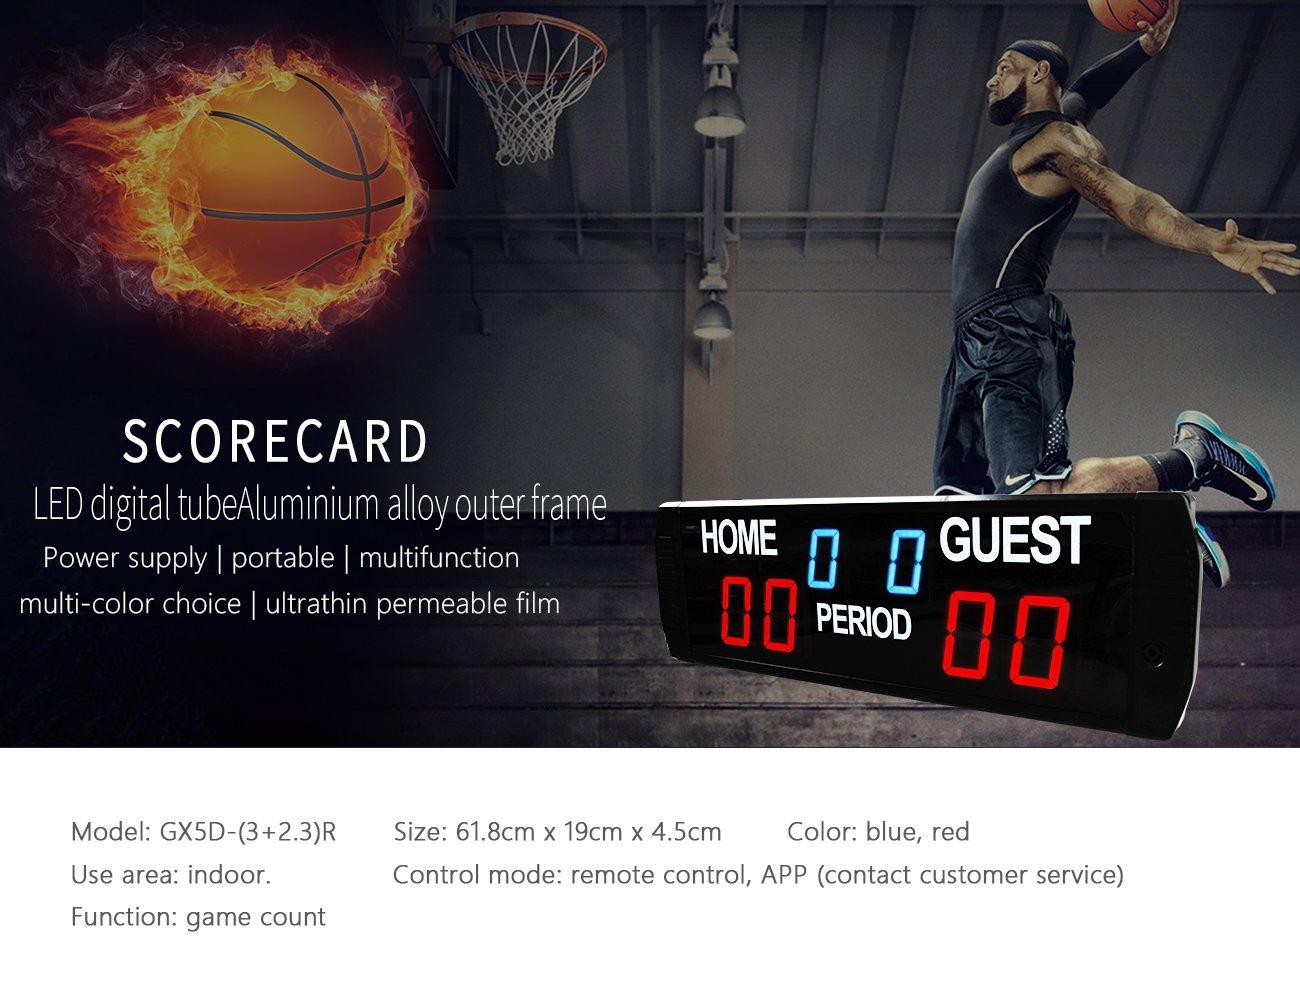 ganxin LED marcador uso en interiores baloncesto/fútbol juego temporizador tamaño: 618mm X 190mm x 450mm LTD